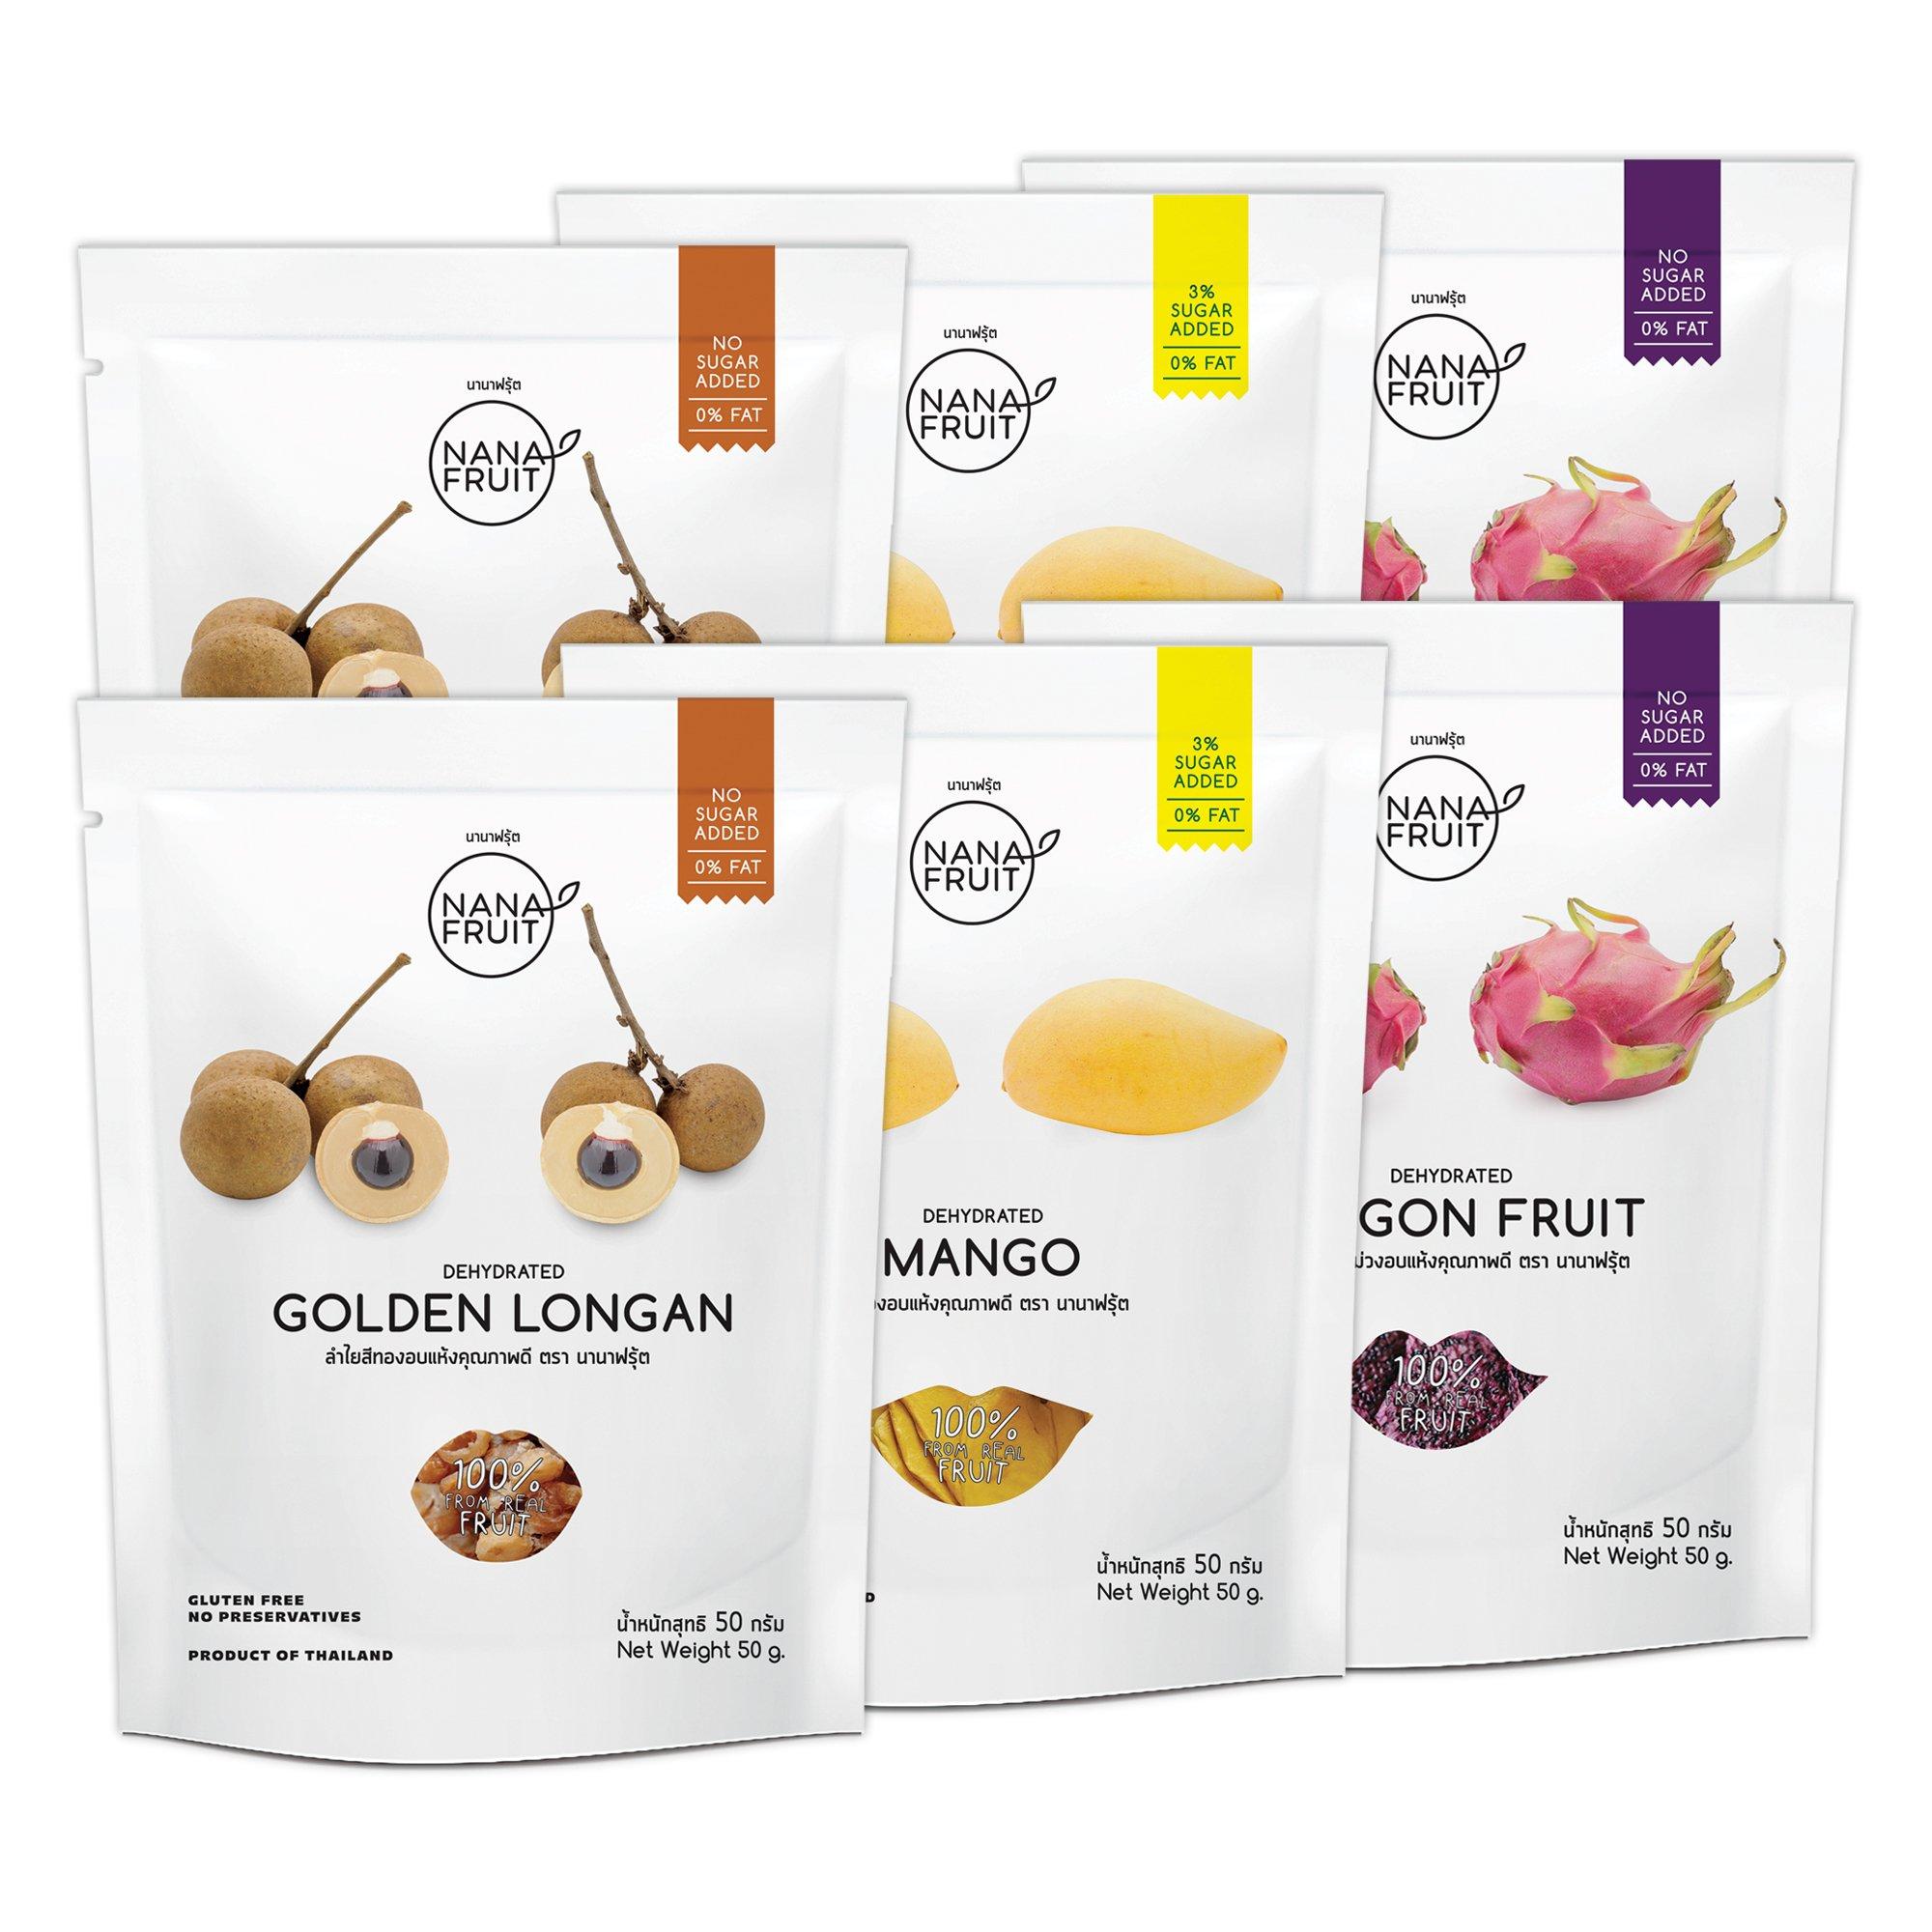 Nana Fruits Dried Longan Pack 50g. (2 Pack) Mango Pack 50g. (2 Pack) and Dragon Fruit Pack 50g. (2 Pack)